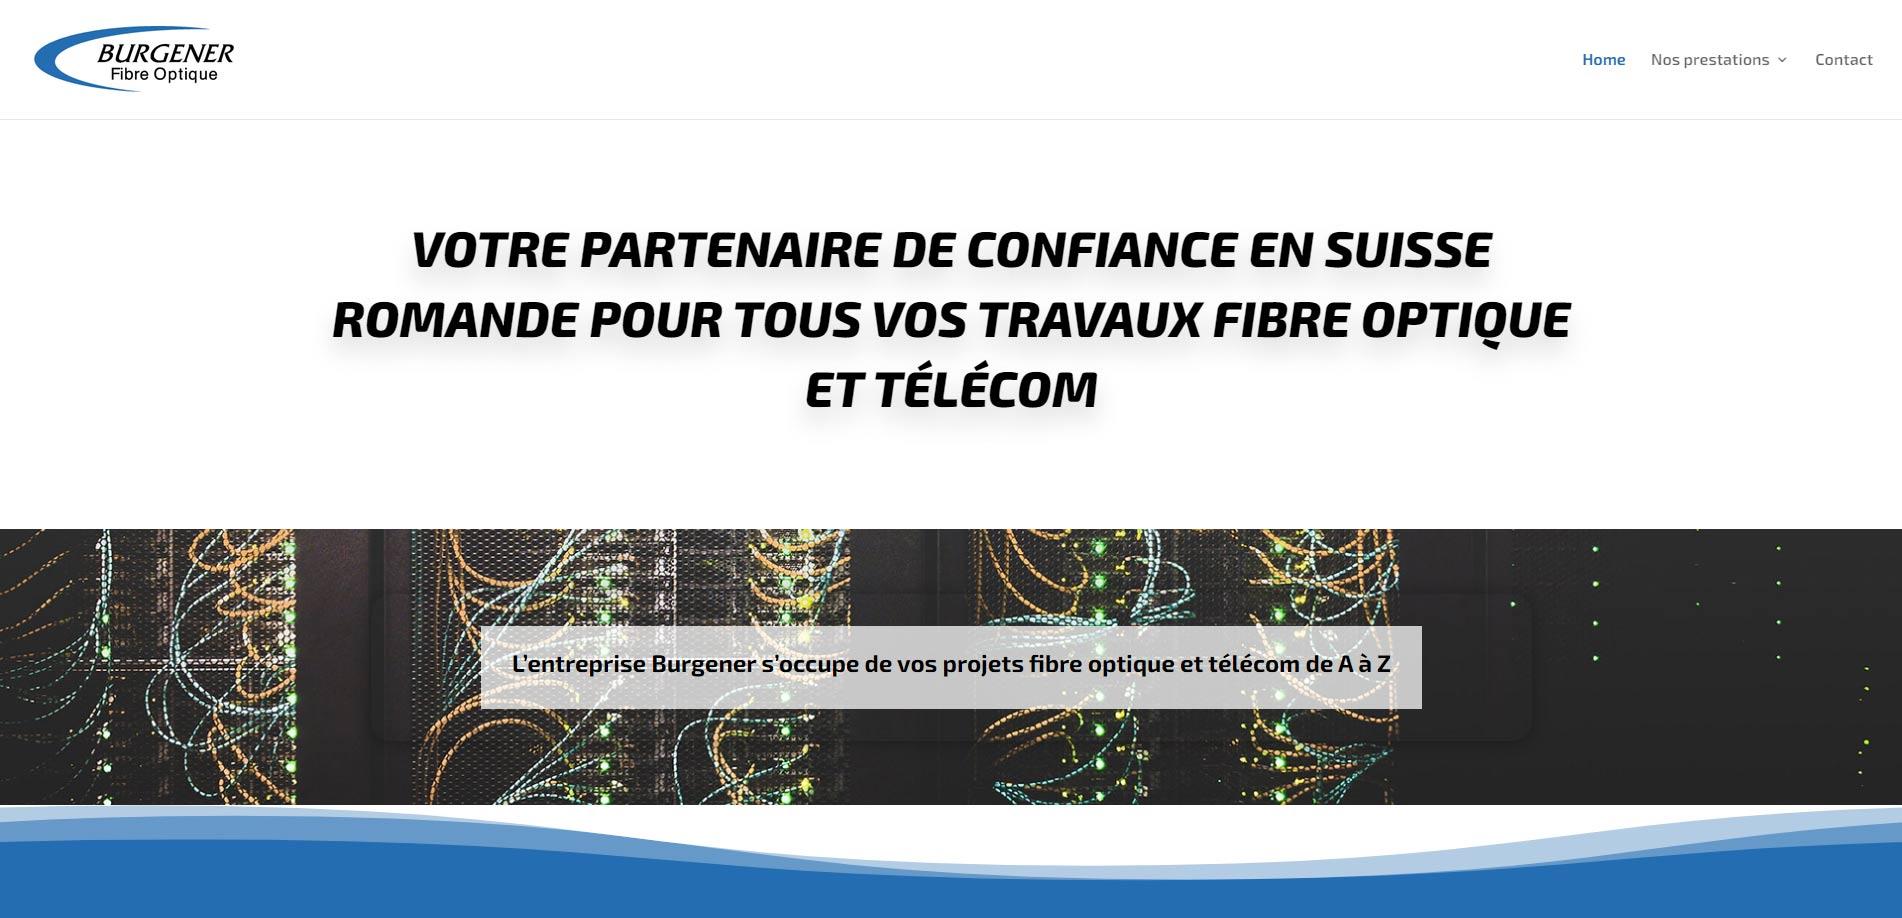 Burgener Fibre Optique homepage website